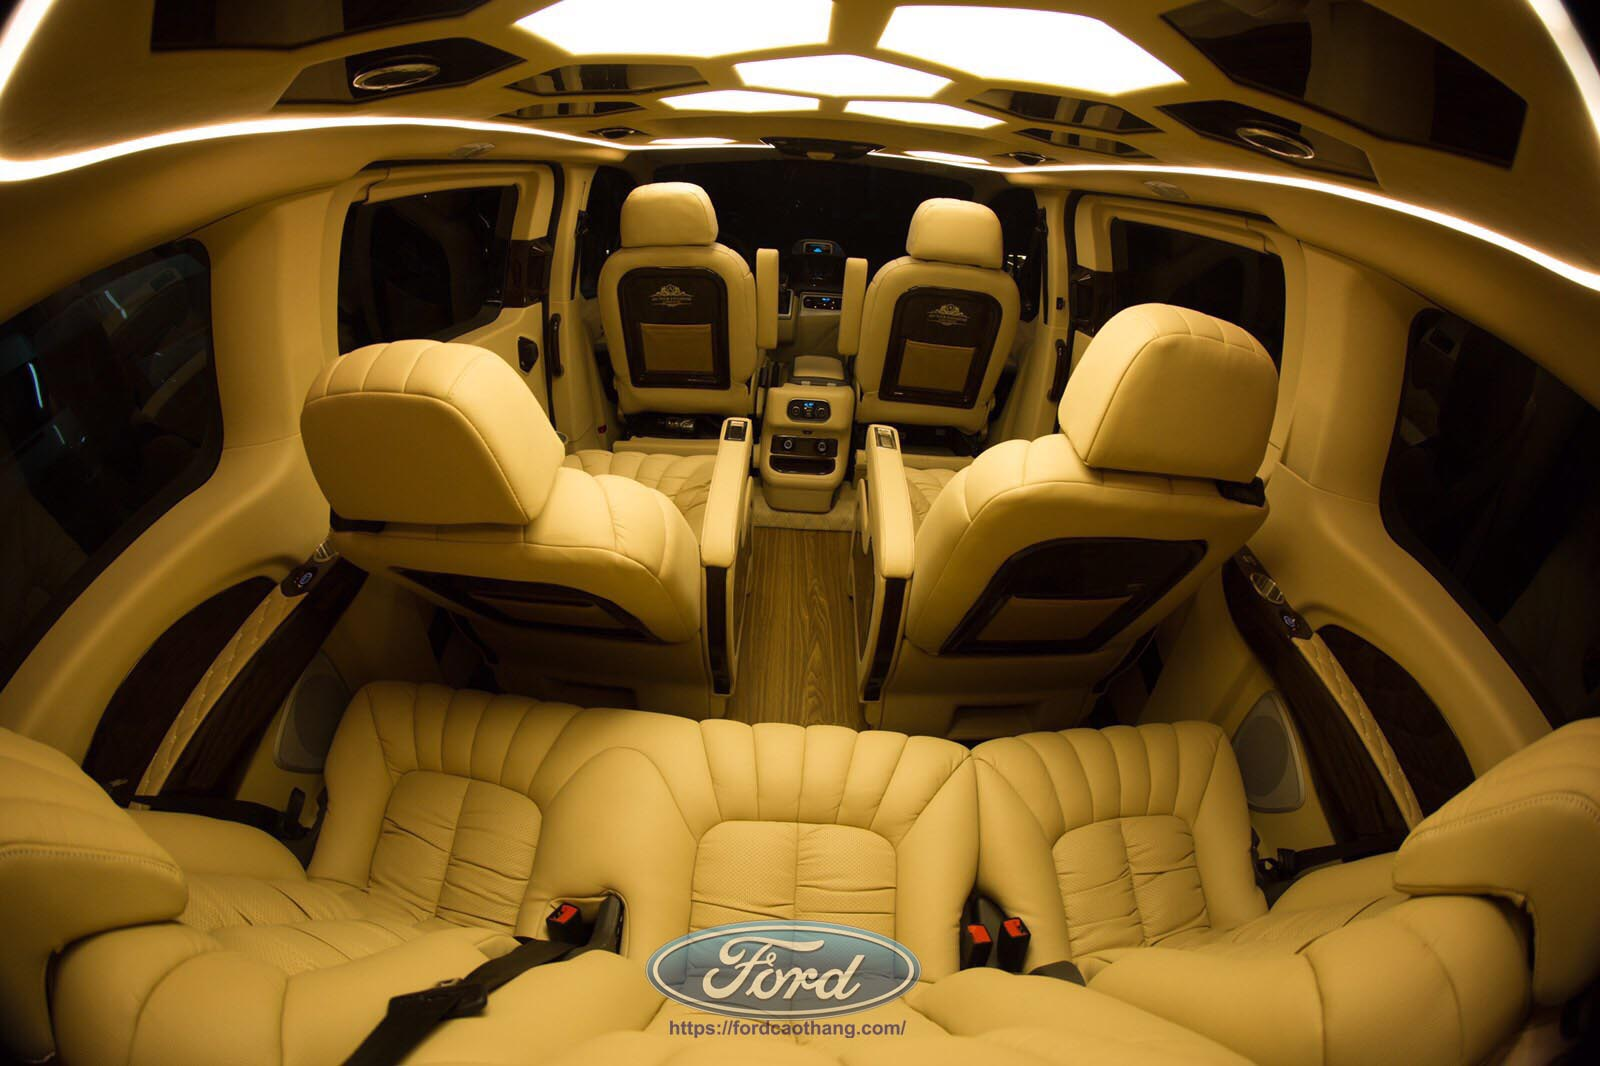 noi that limousine 7 cho